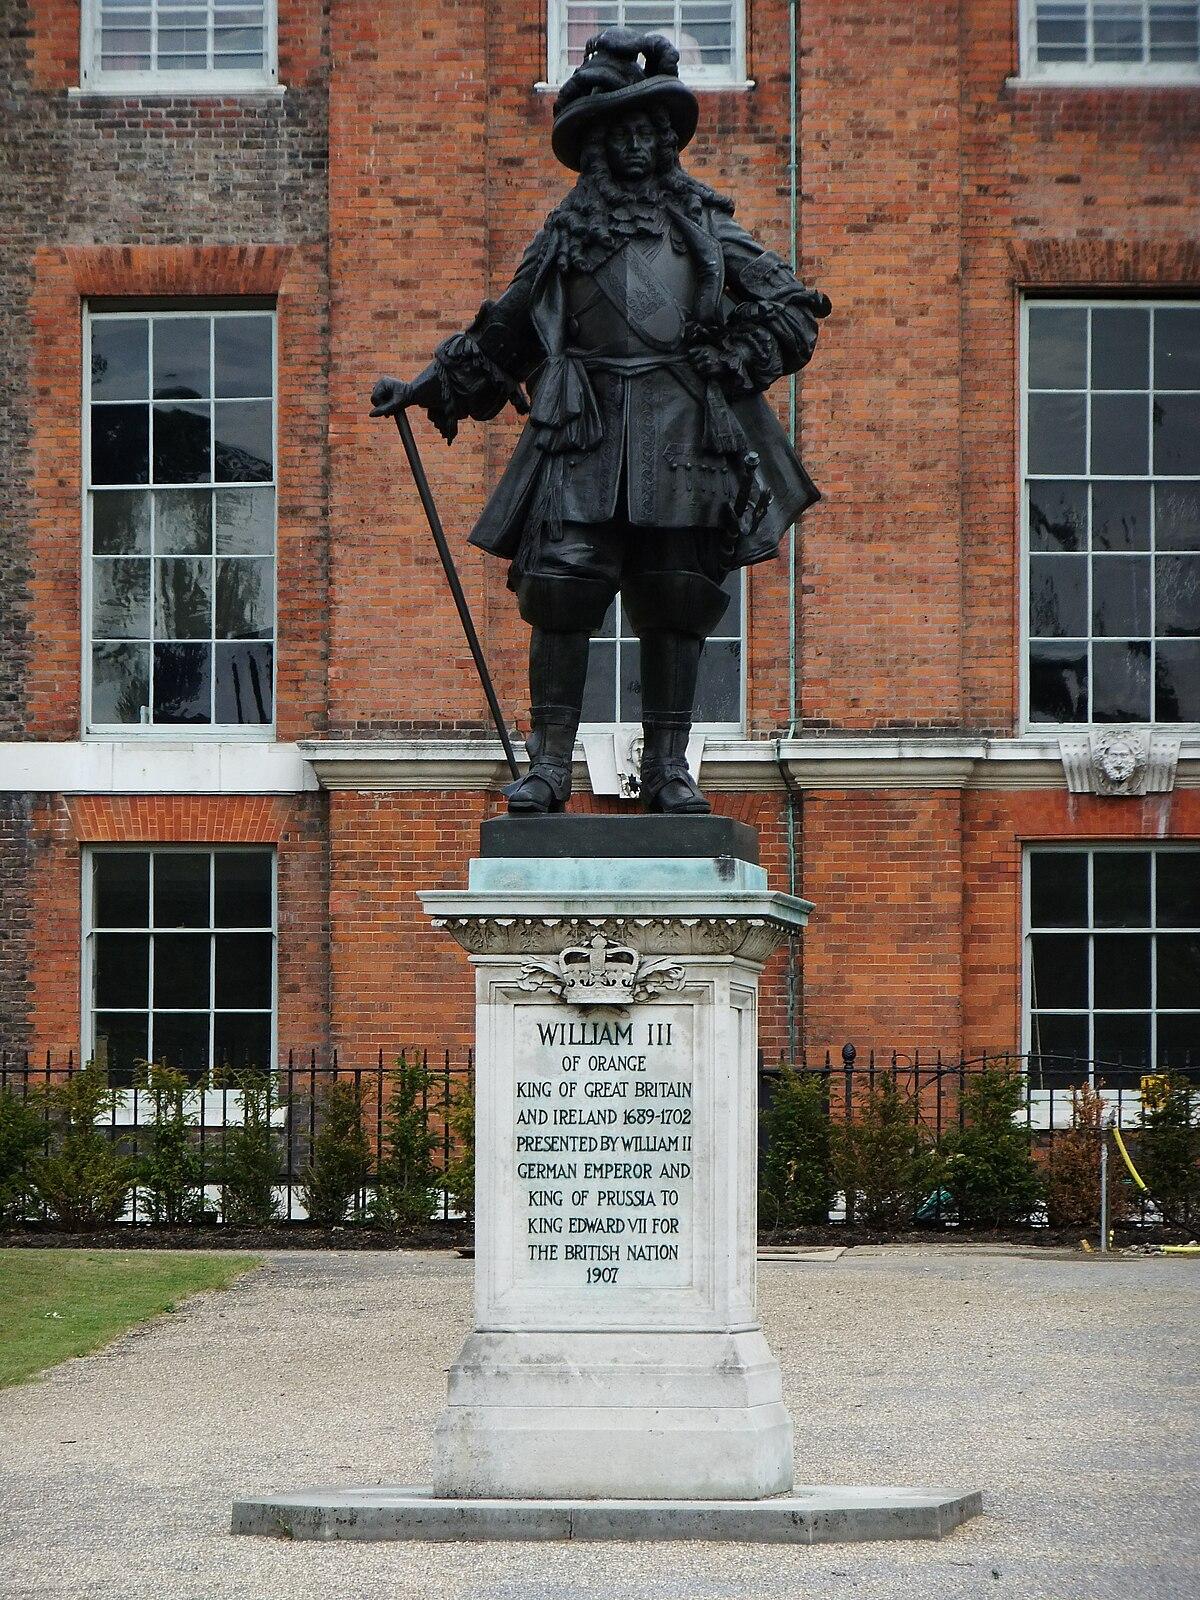 William III of Orange statue, Kensington Palace - DSCF0293.JPG